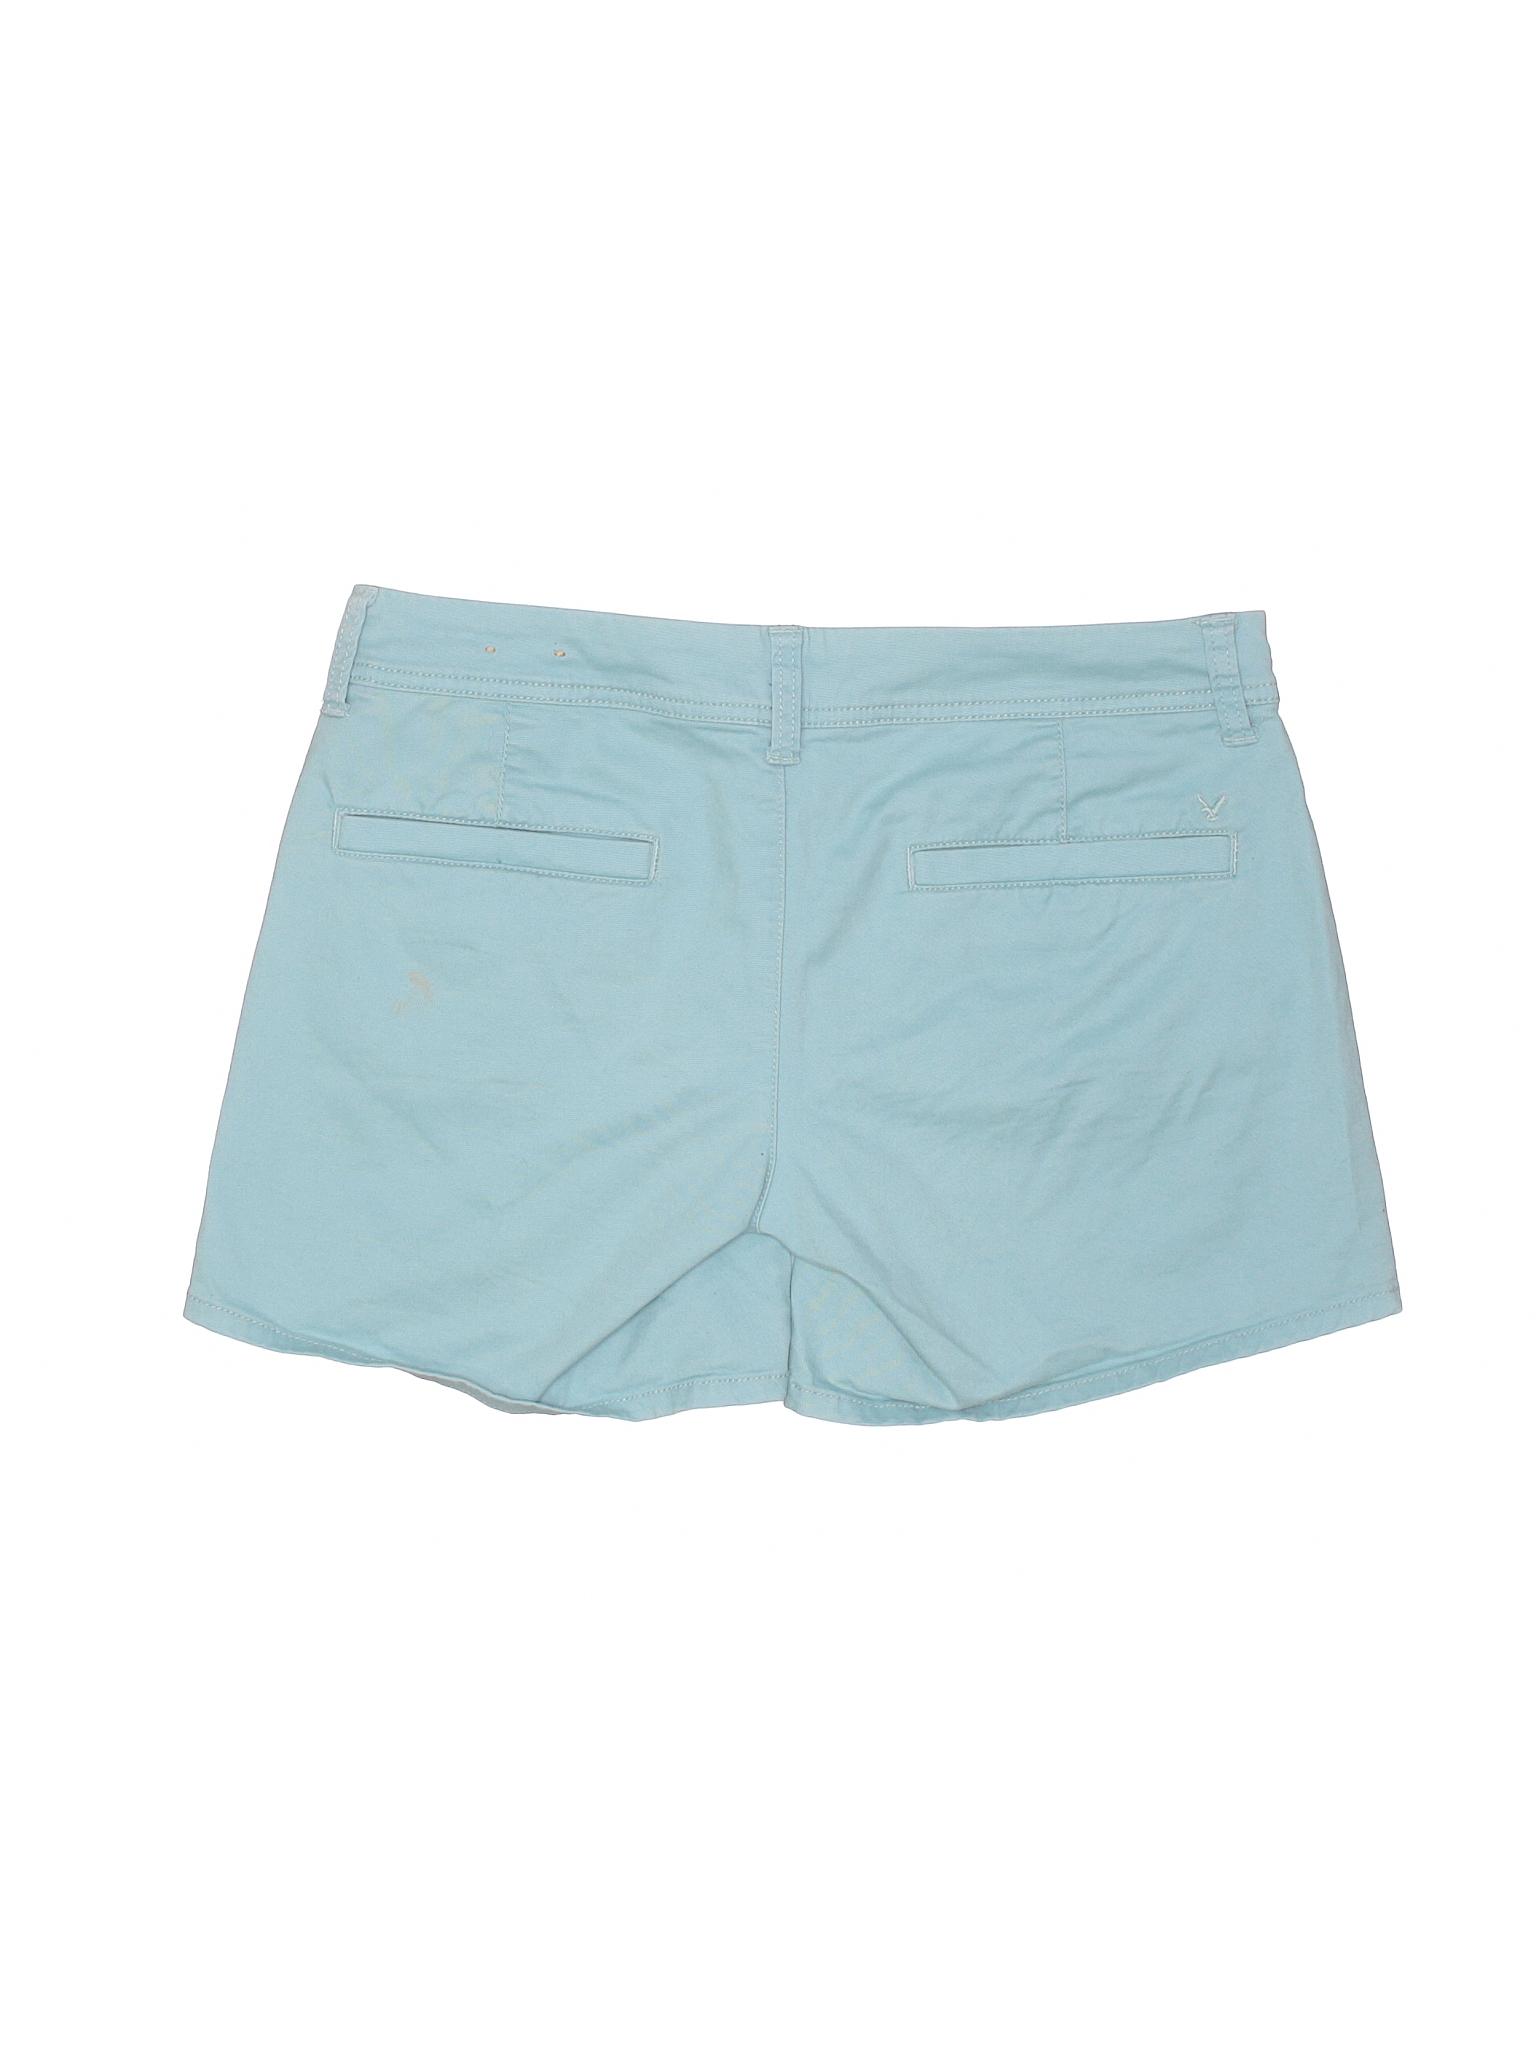 Khaki American Outfitters Eagle Shorts Boutique leisure q7BHwF1c1